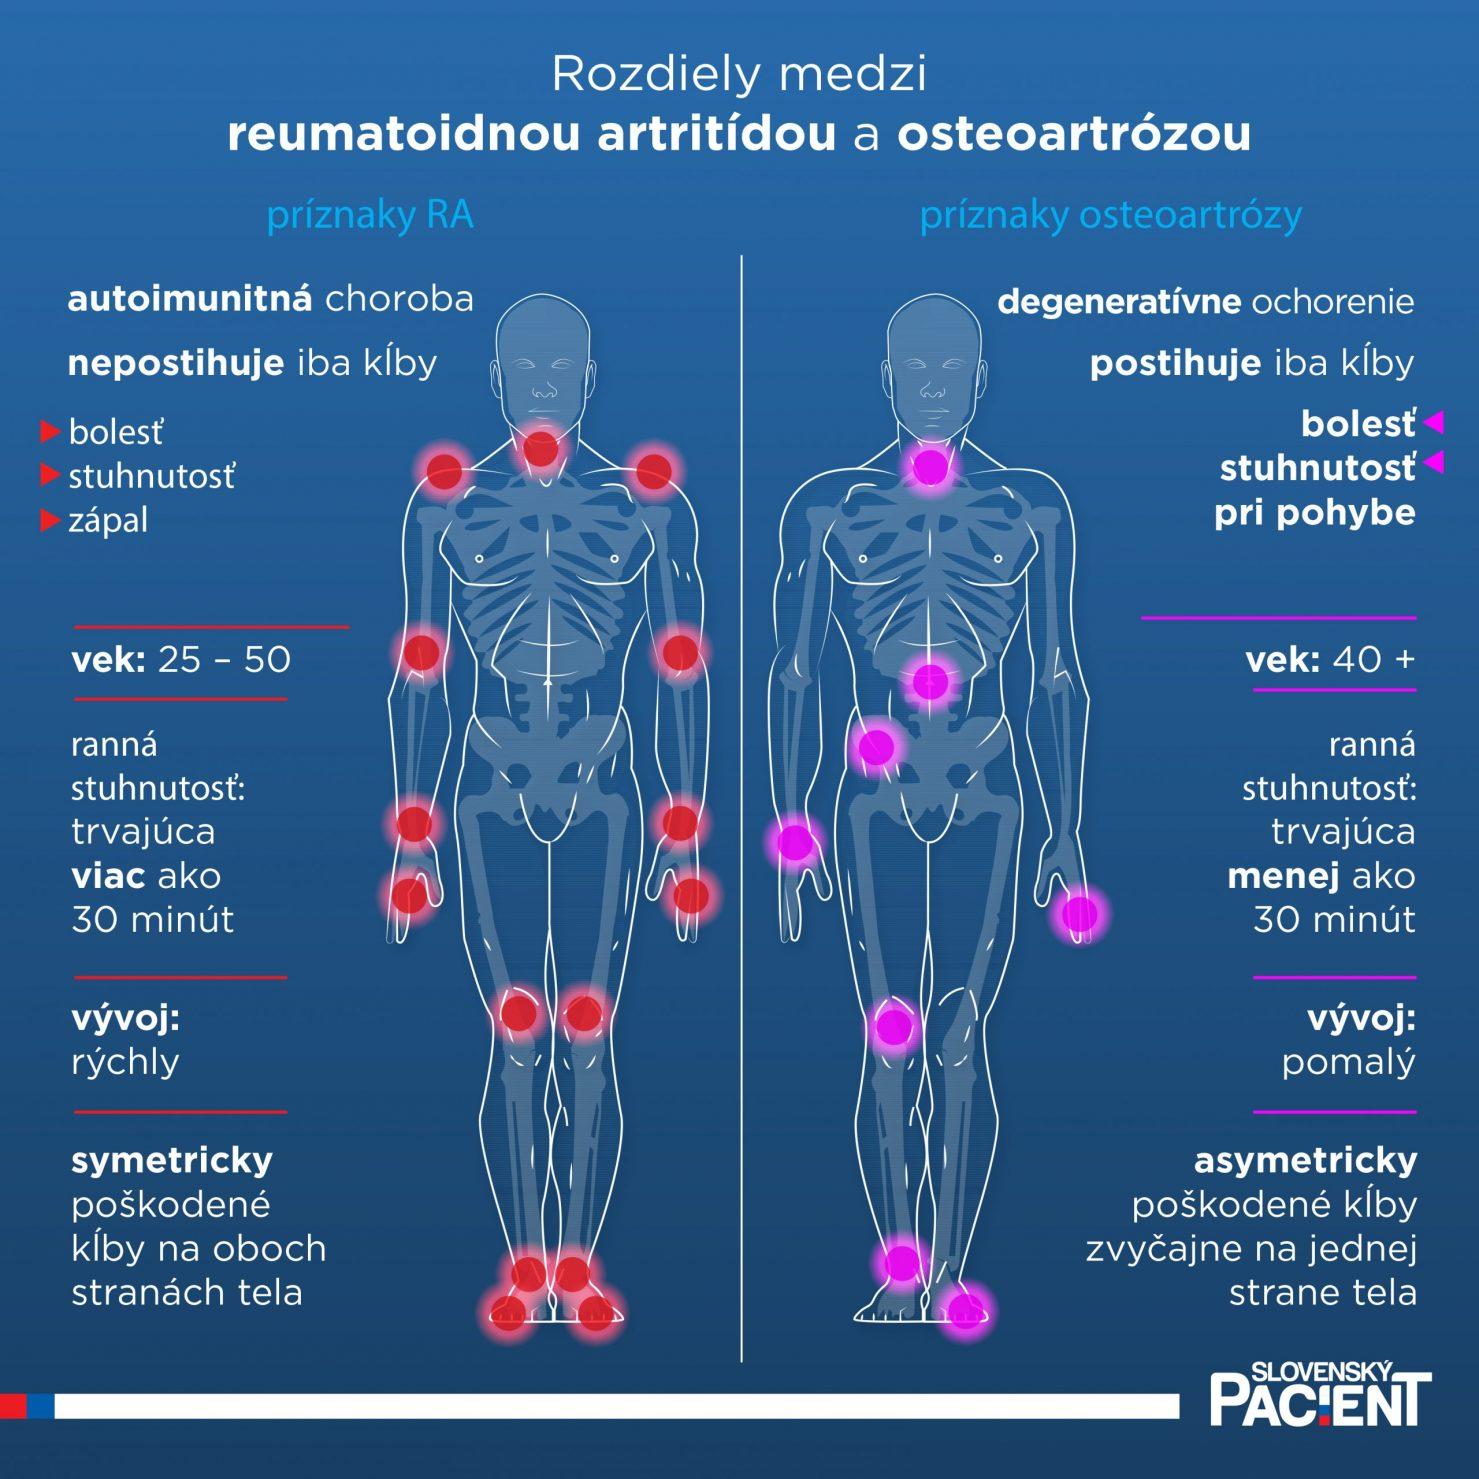 Rozdiely medzi reumatoidnou artrídou a osteoartrózou